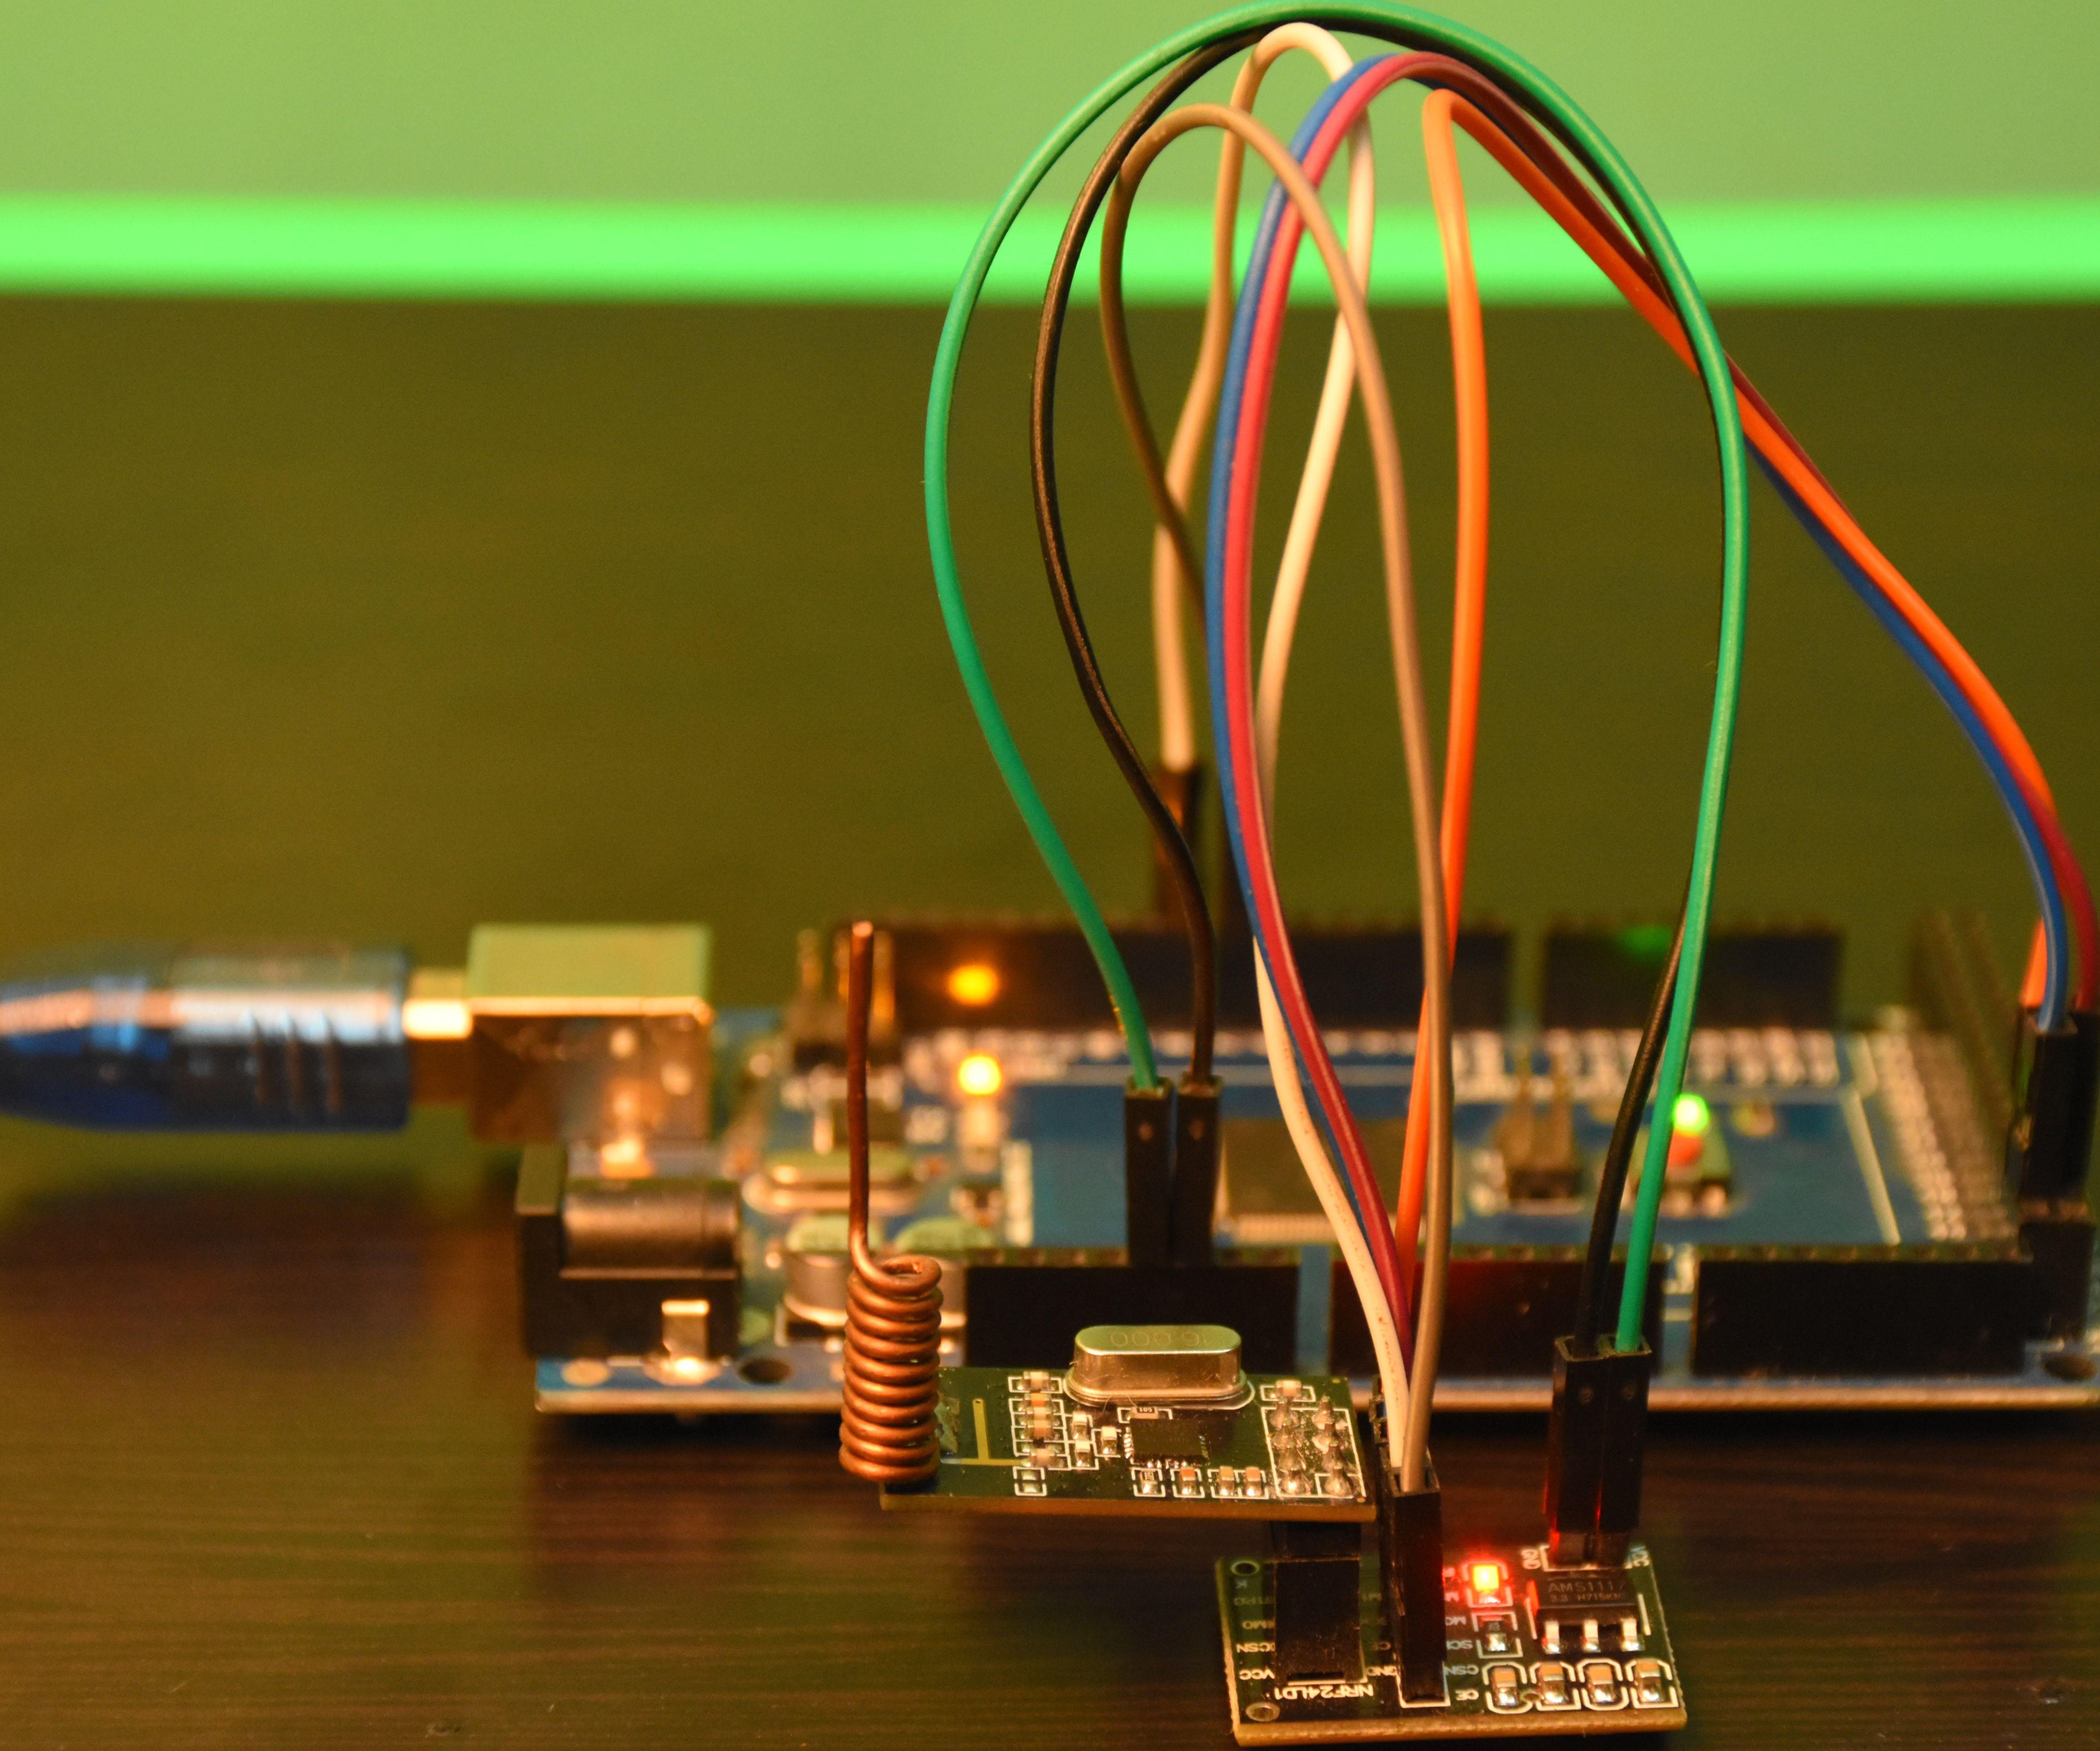 Arduino Wireless Communication Using NRF24L01